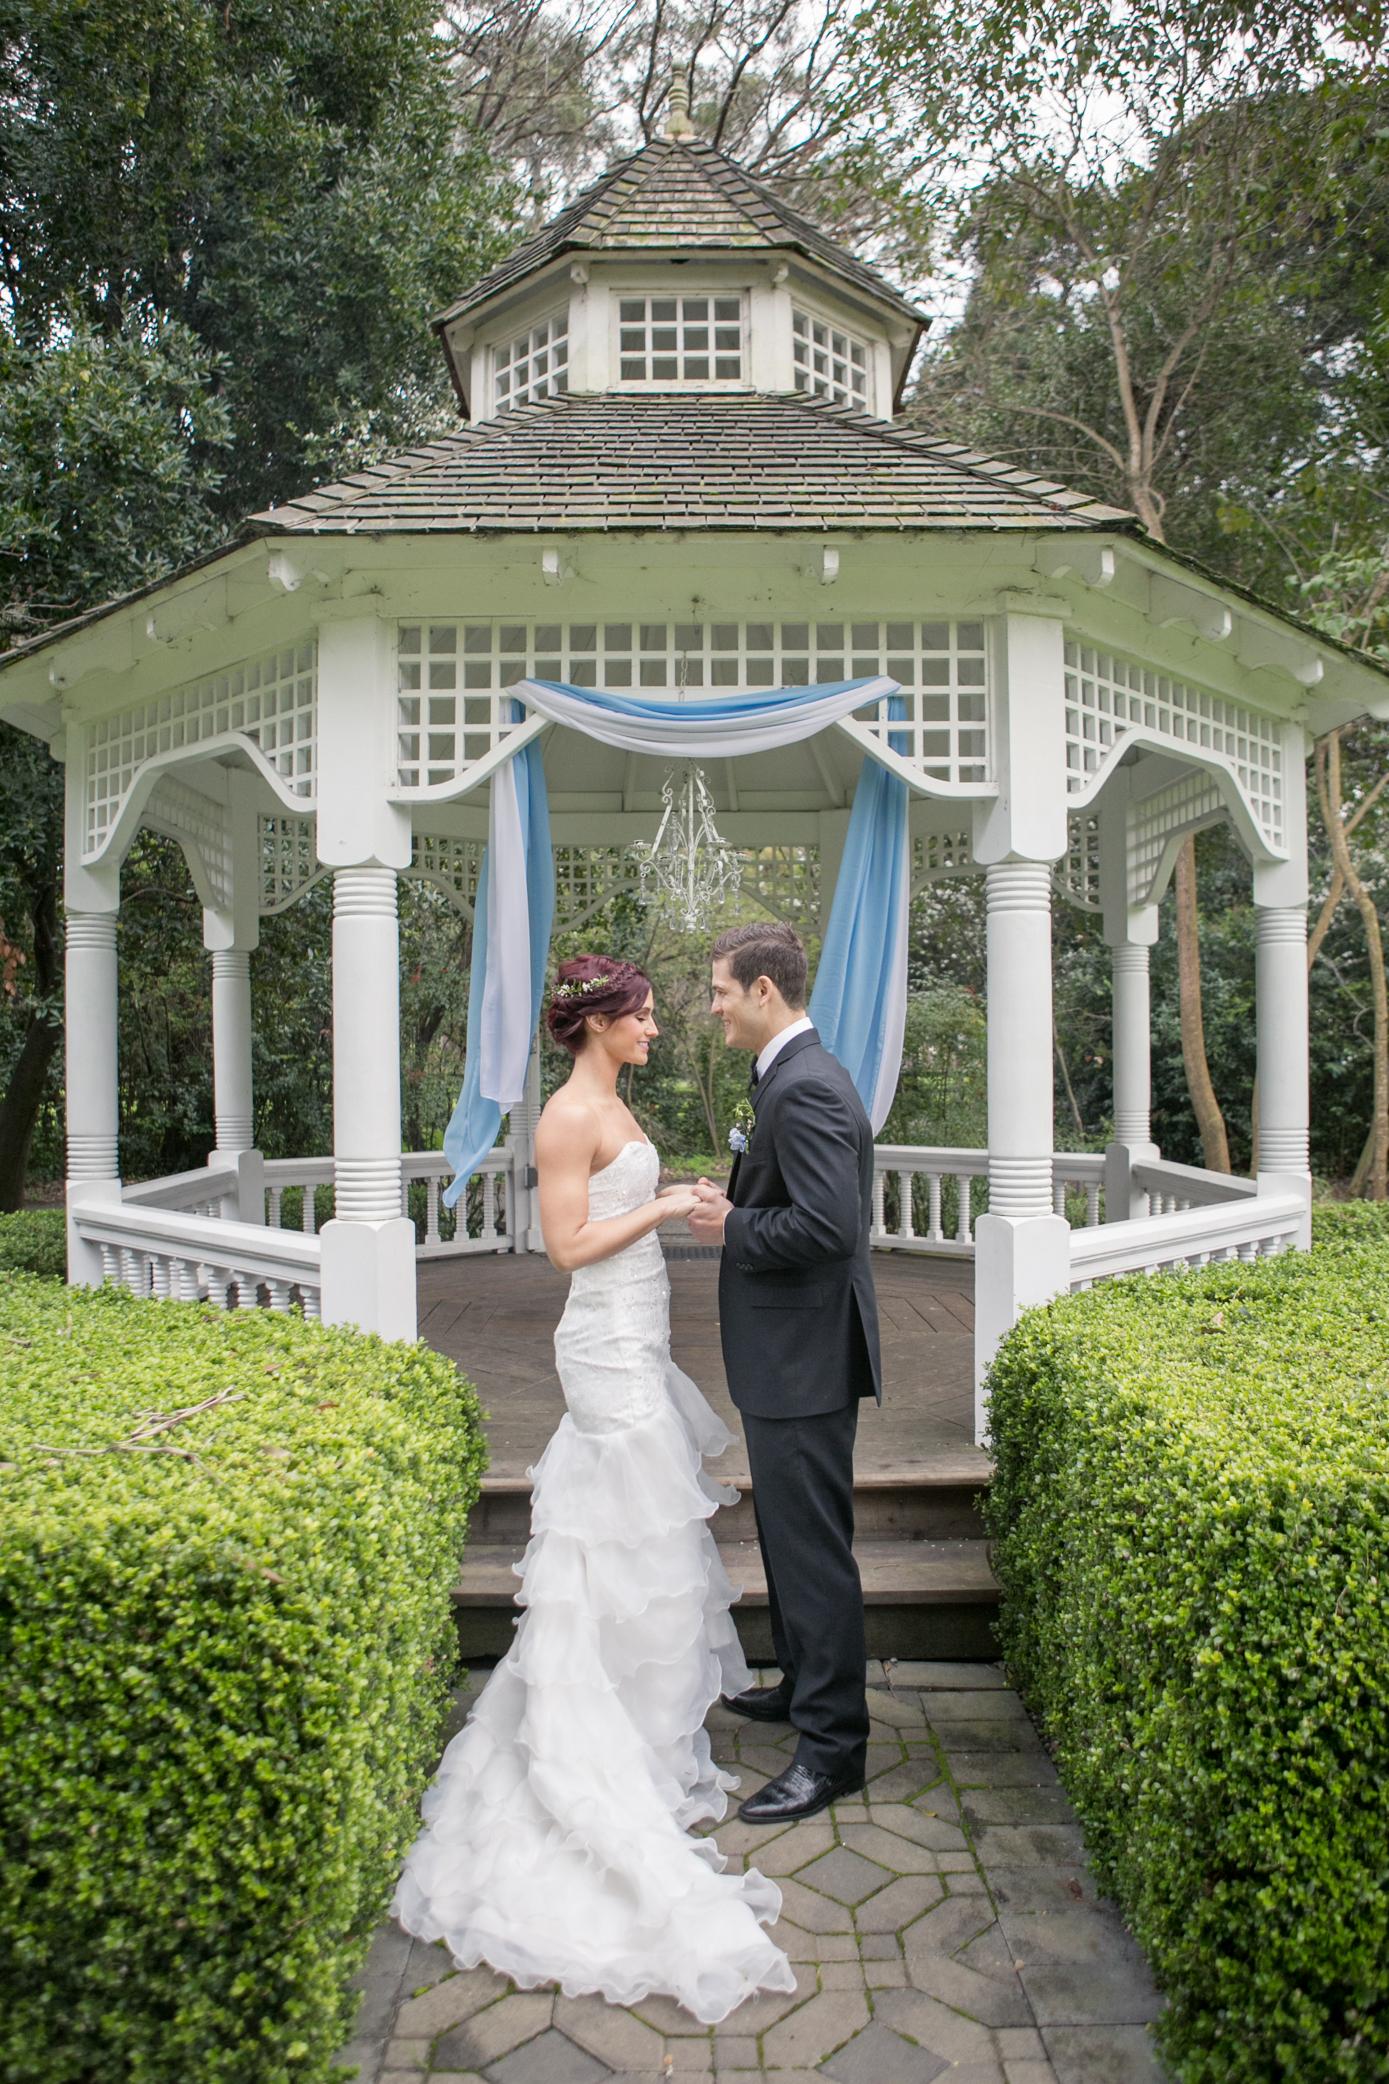 San Jose Wedding Photographer - Michelle Chang Photography